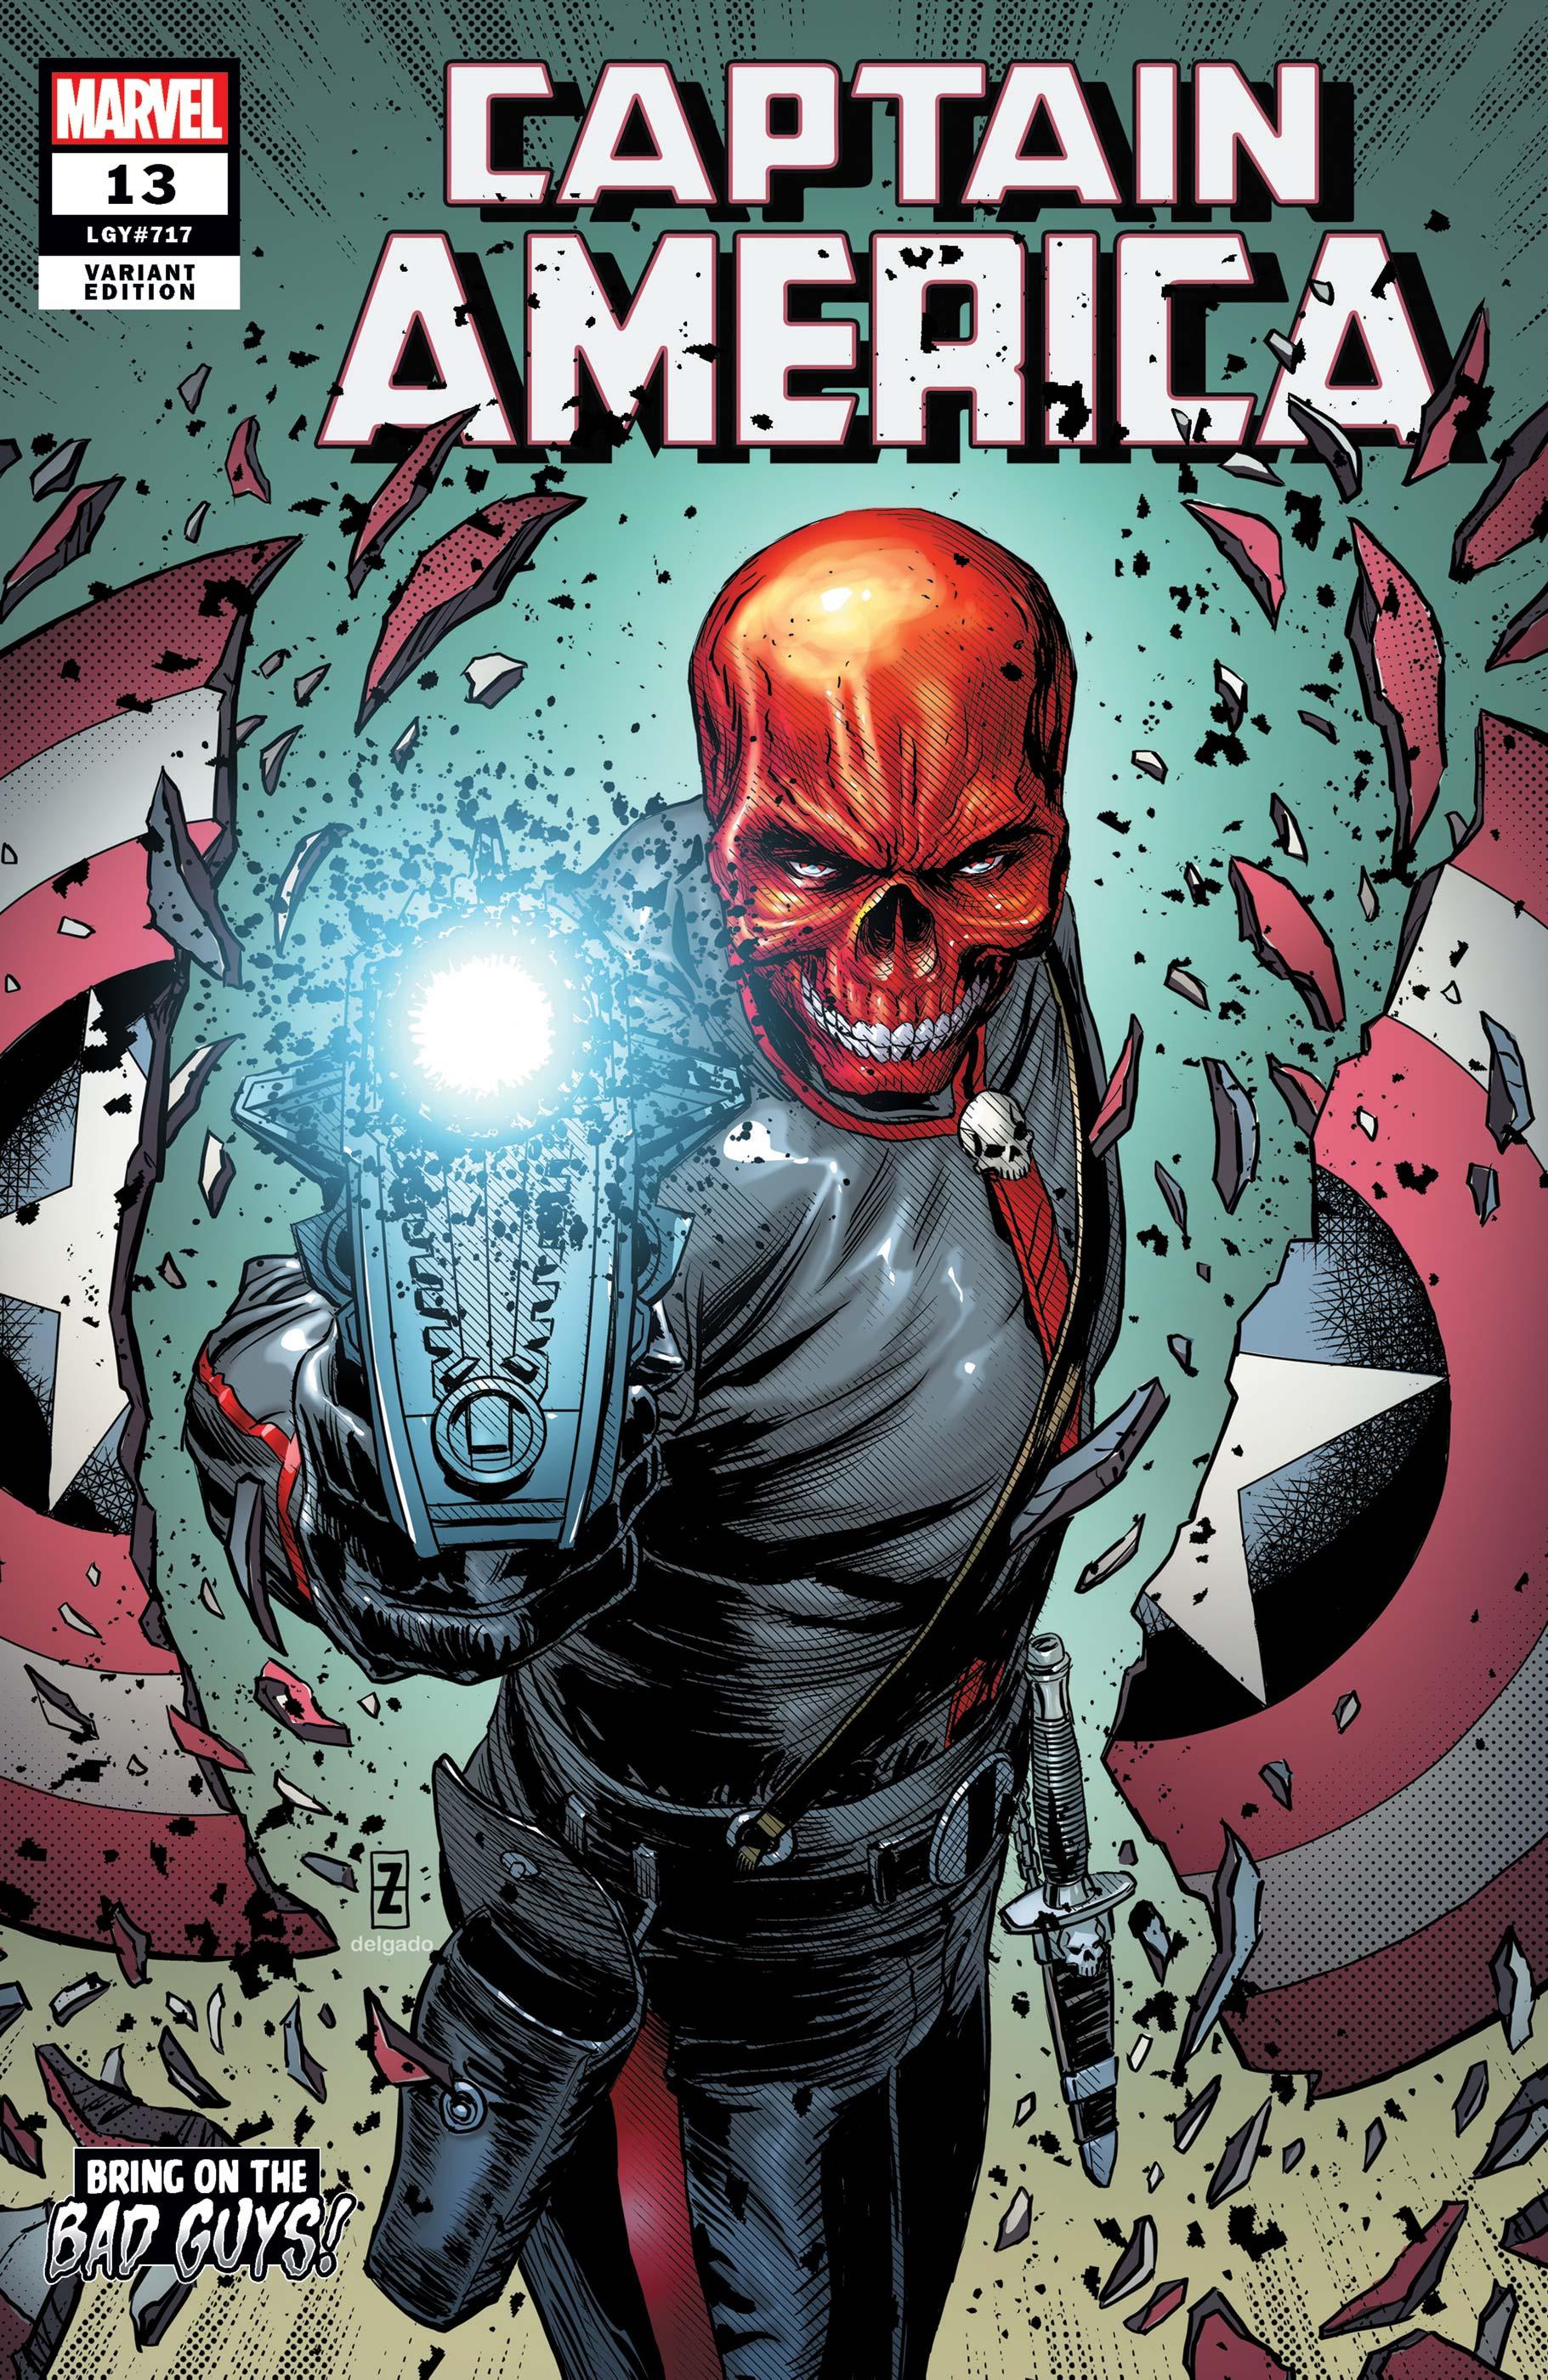 Captain America Vol 9 13 Bring on the Bad Guys Variant.jpg